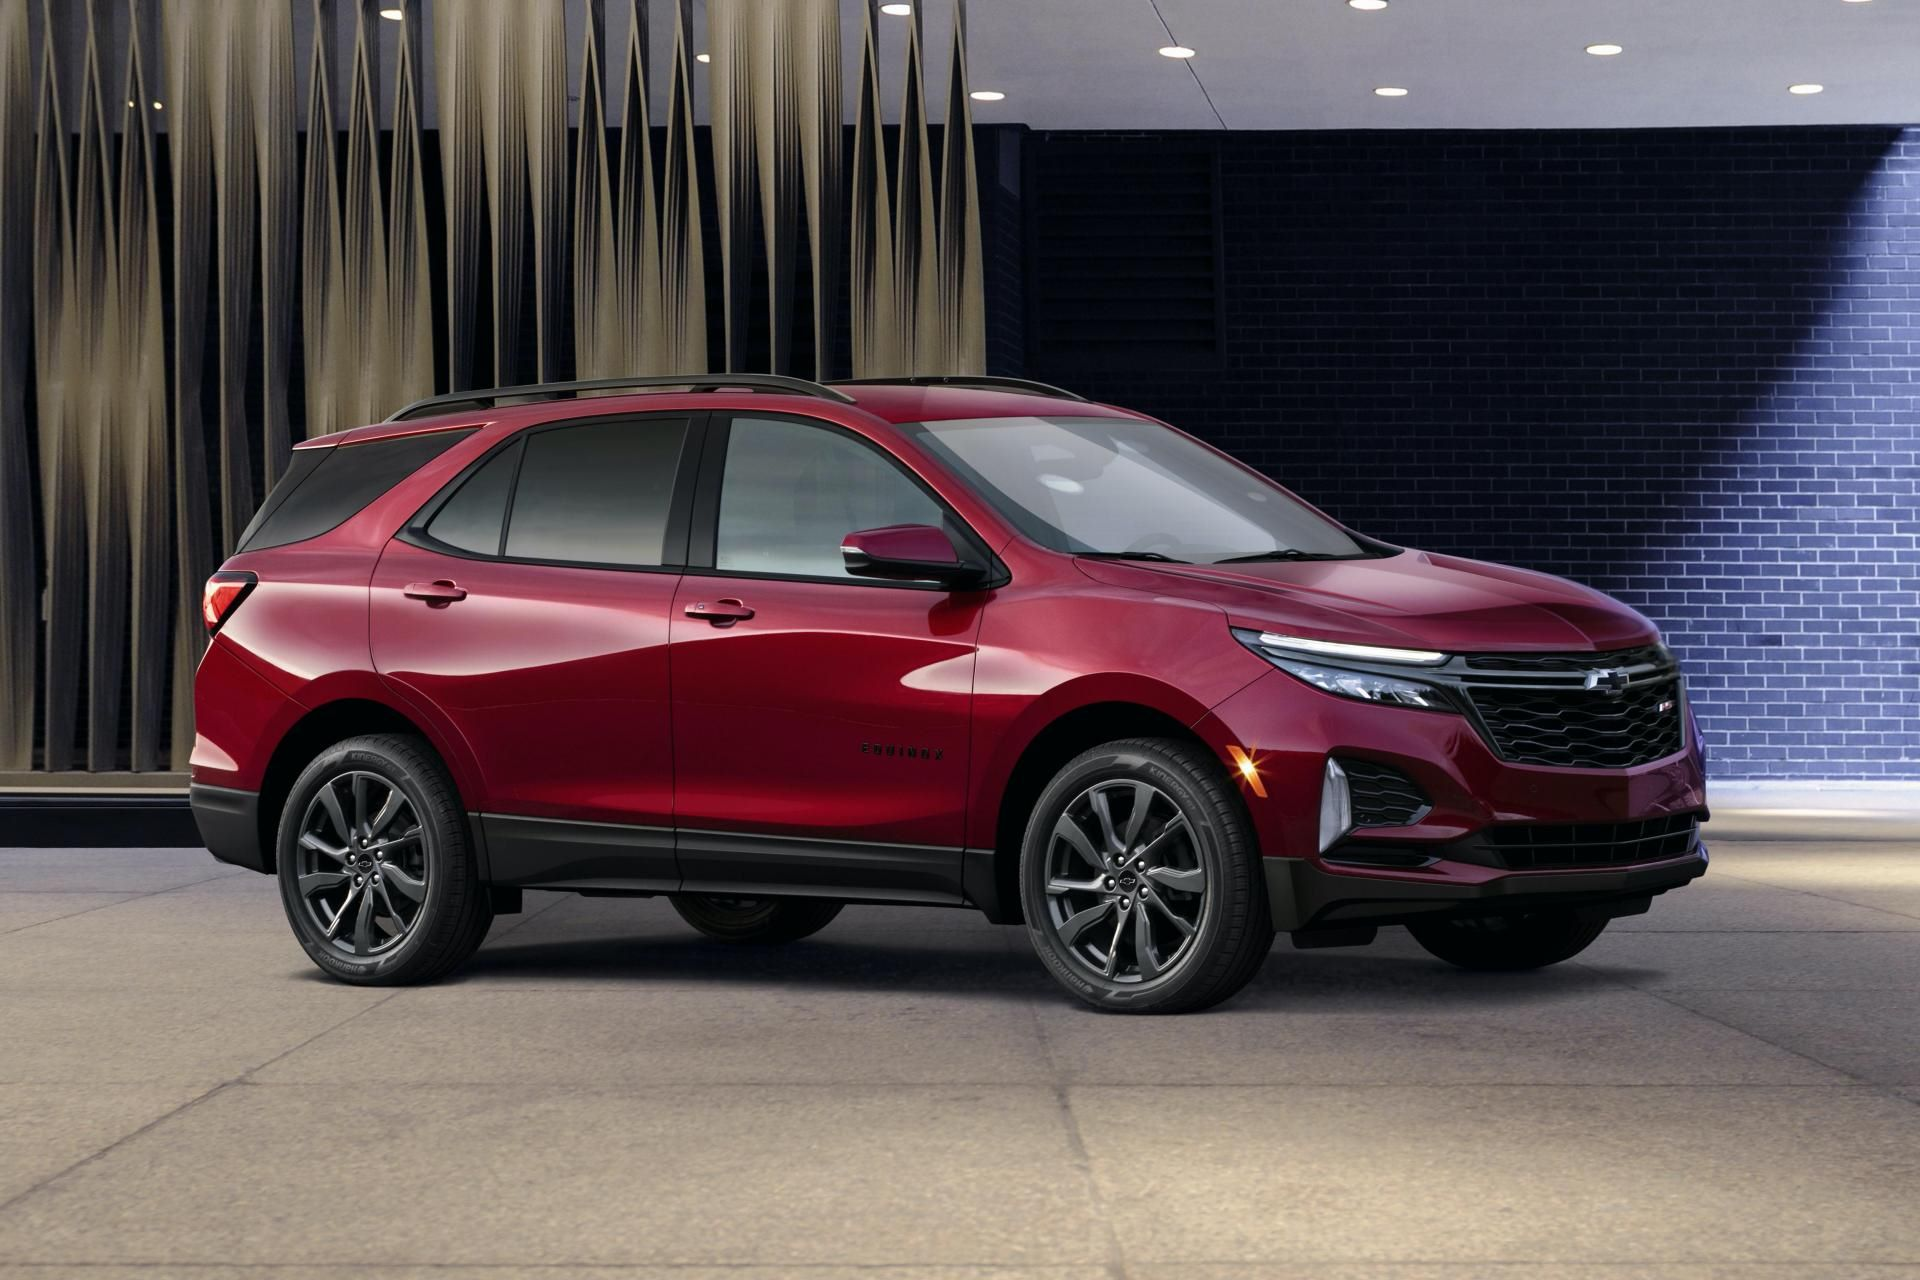 Chevrolet-Equinox-facelift-2020-4